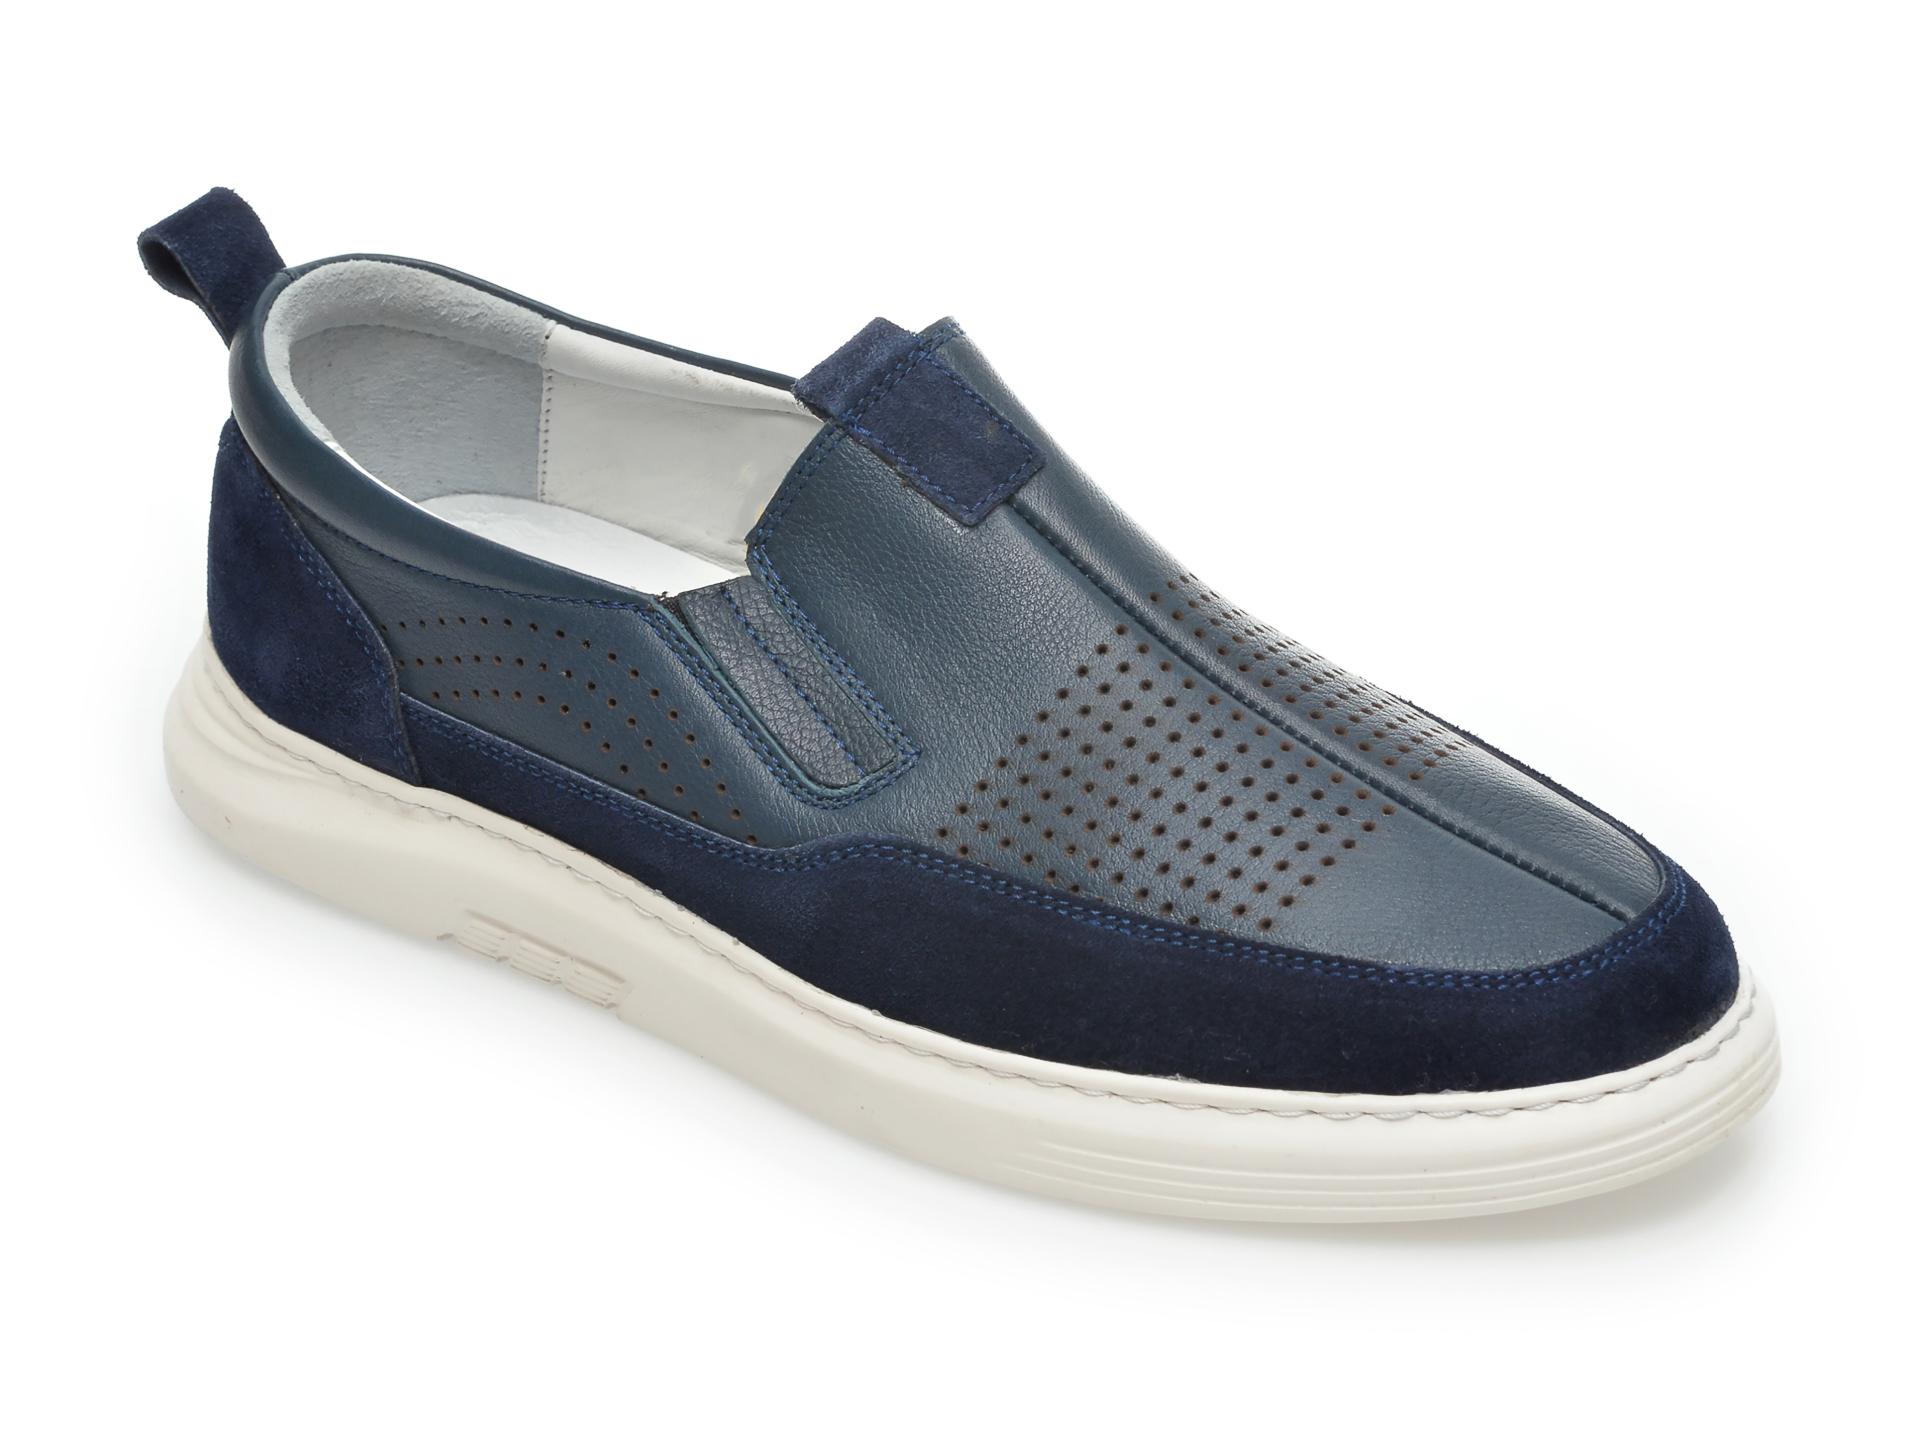 Pantofi OTTER bleumarin, 2026, din piele naturala imagine